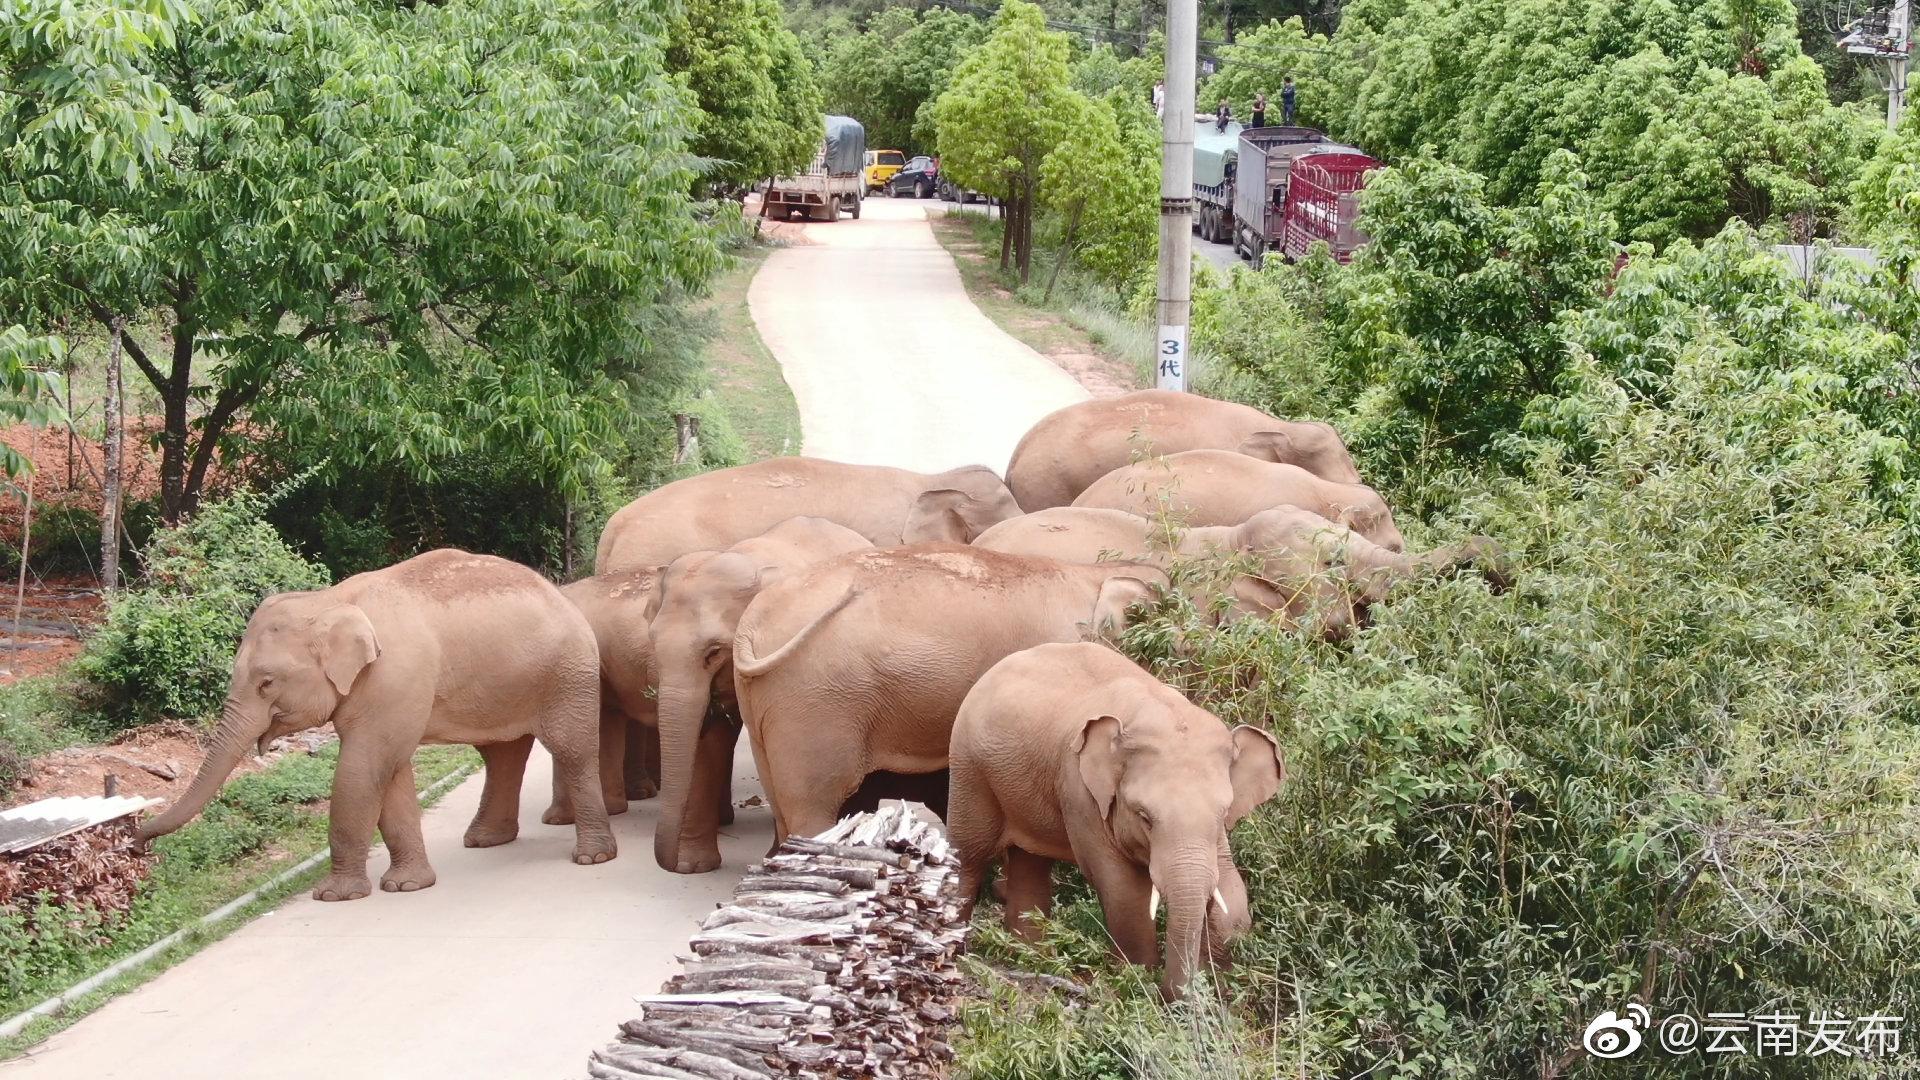 elephants3.jpeg